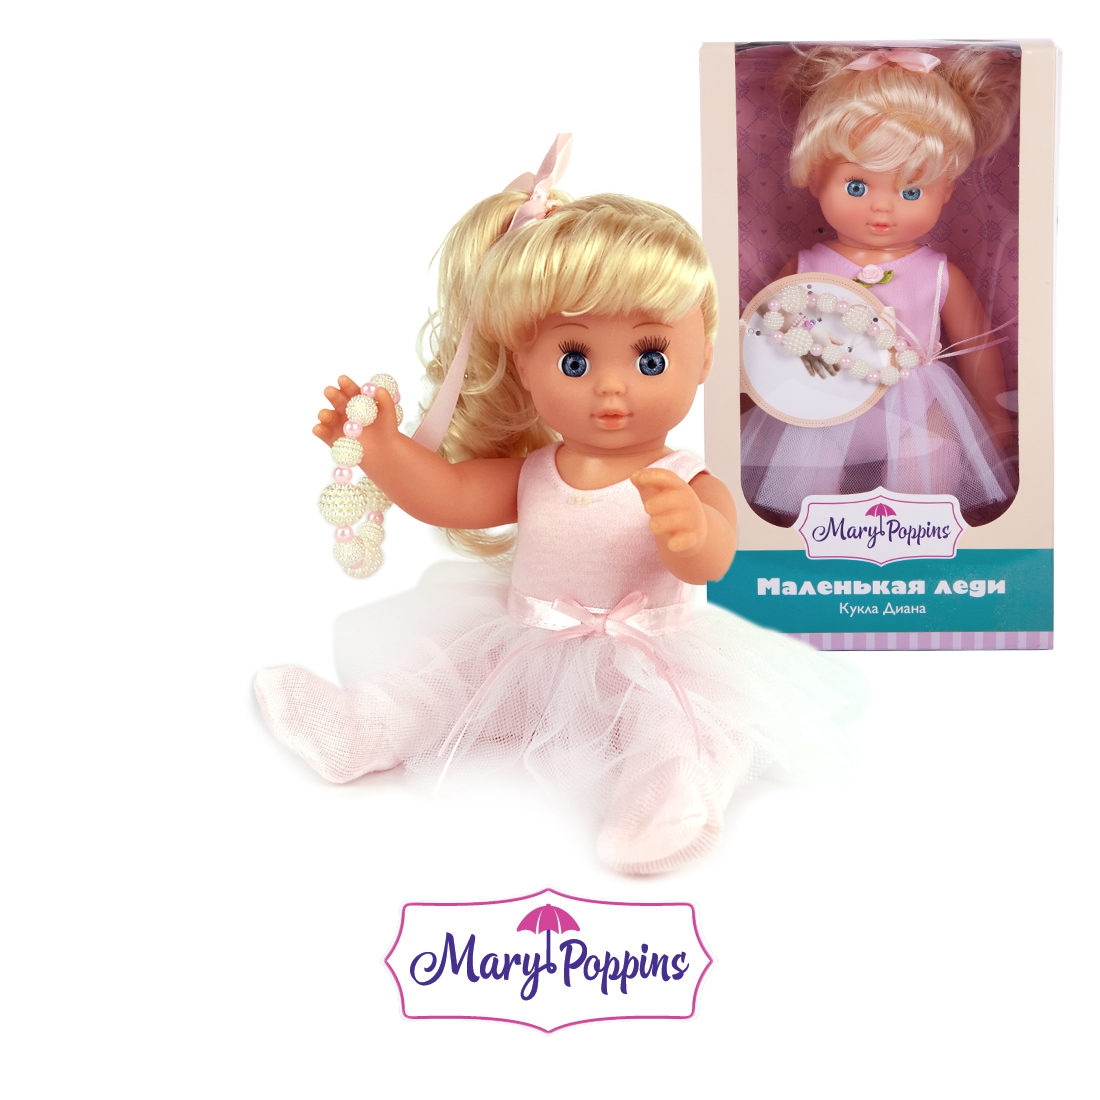 Другие куклы Mary Poppins Маленькая леди Диана куклы vika smolyanitskaya кукла